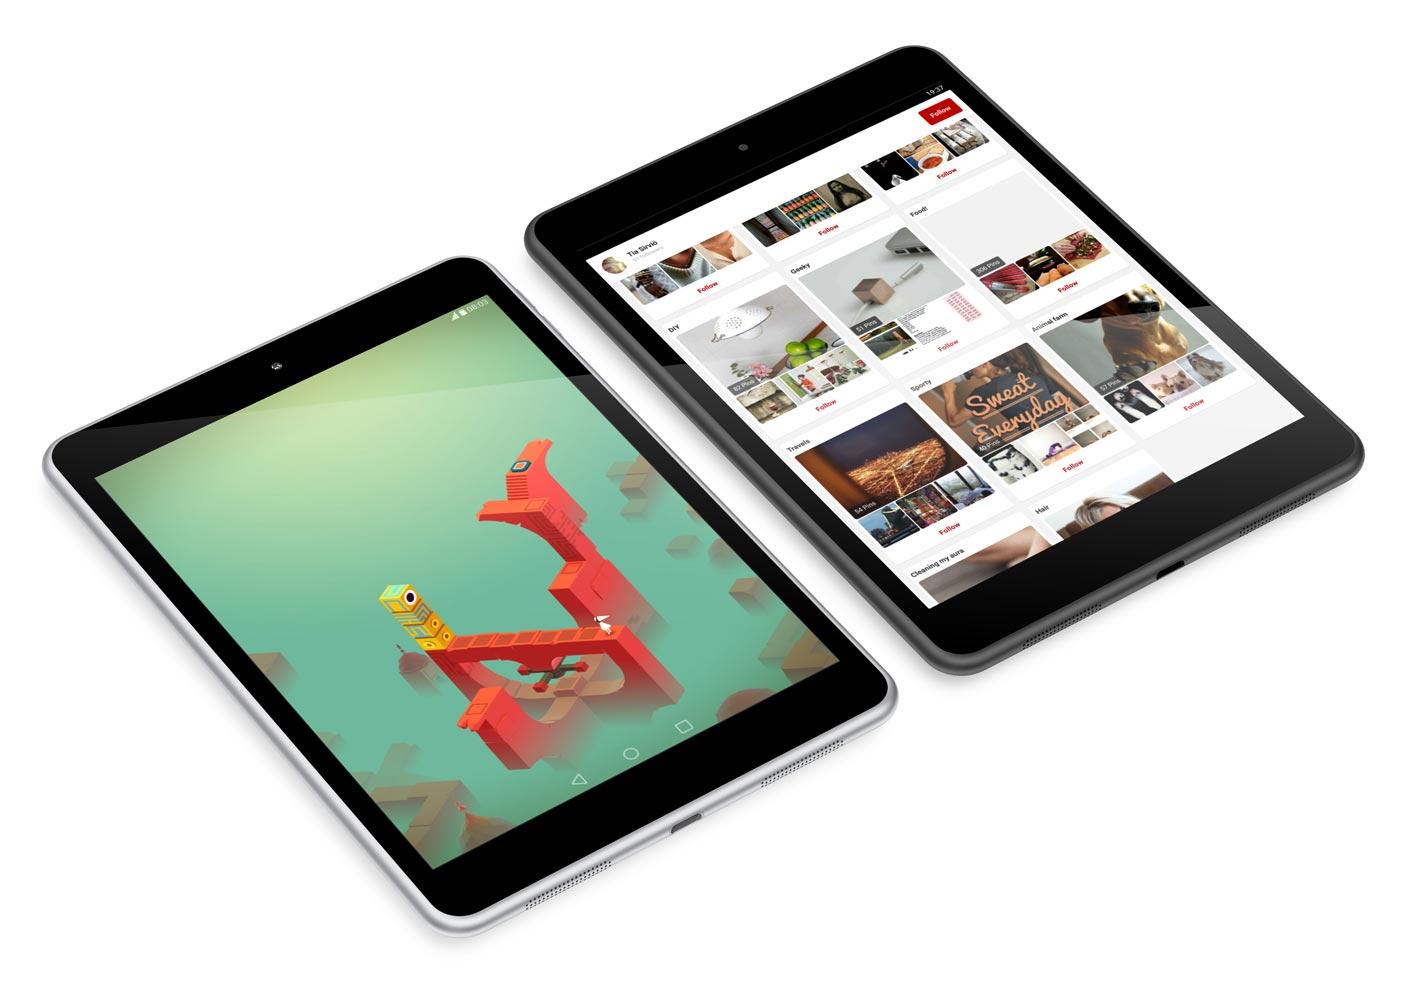 Nokia отчиталась об успешном старте продаж планшета N1